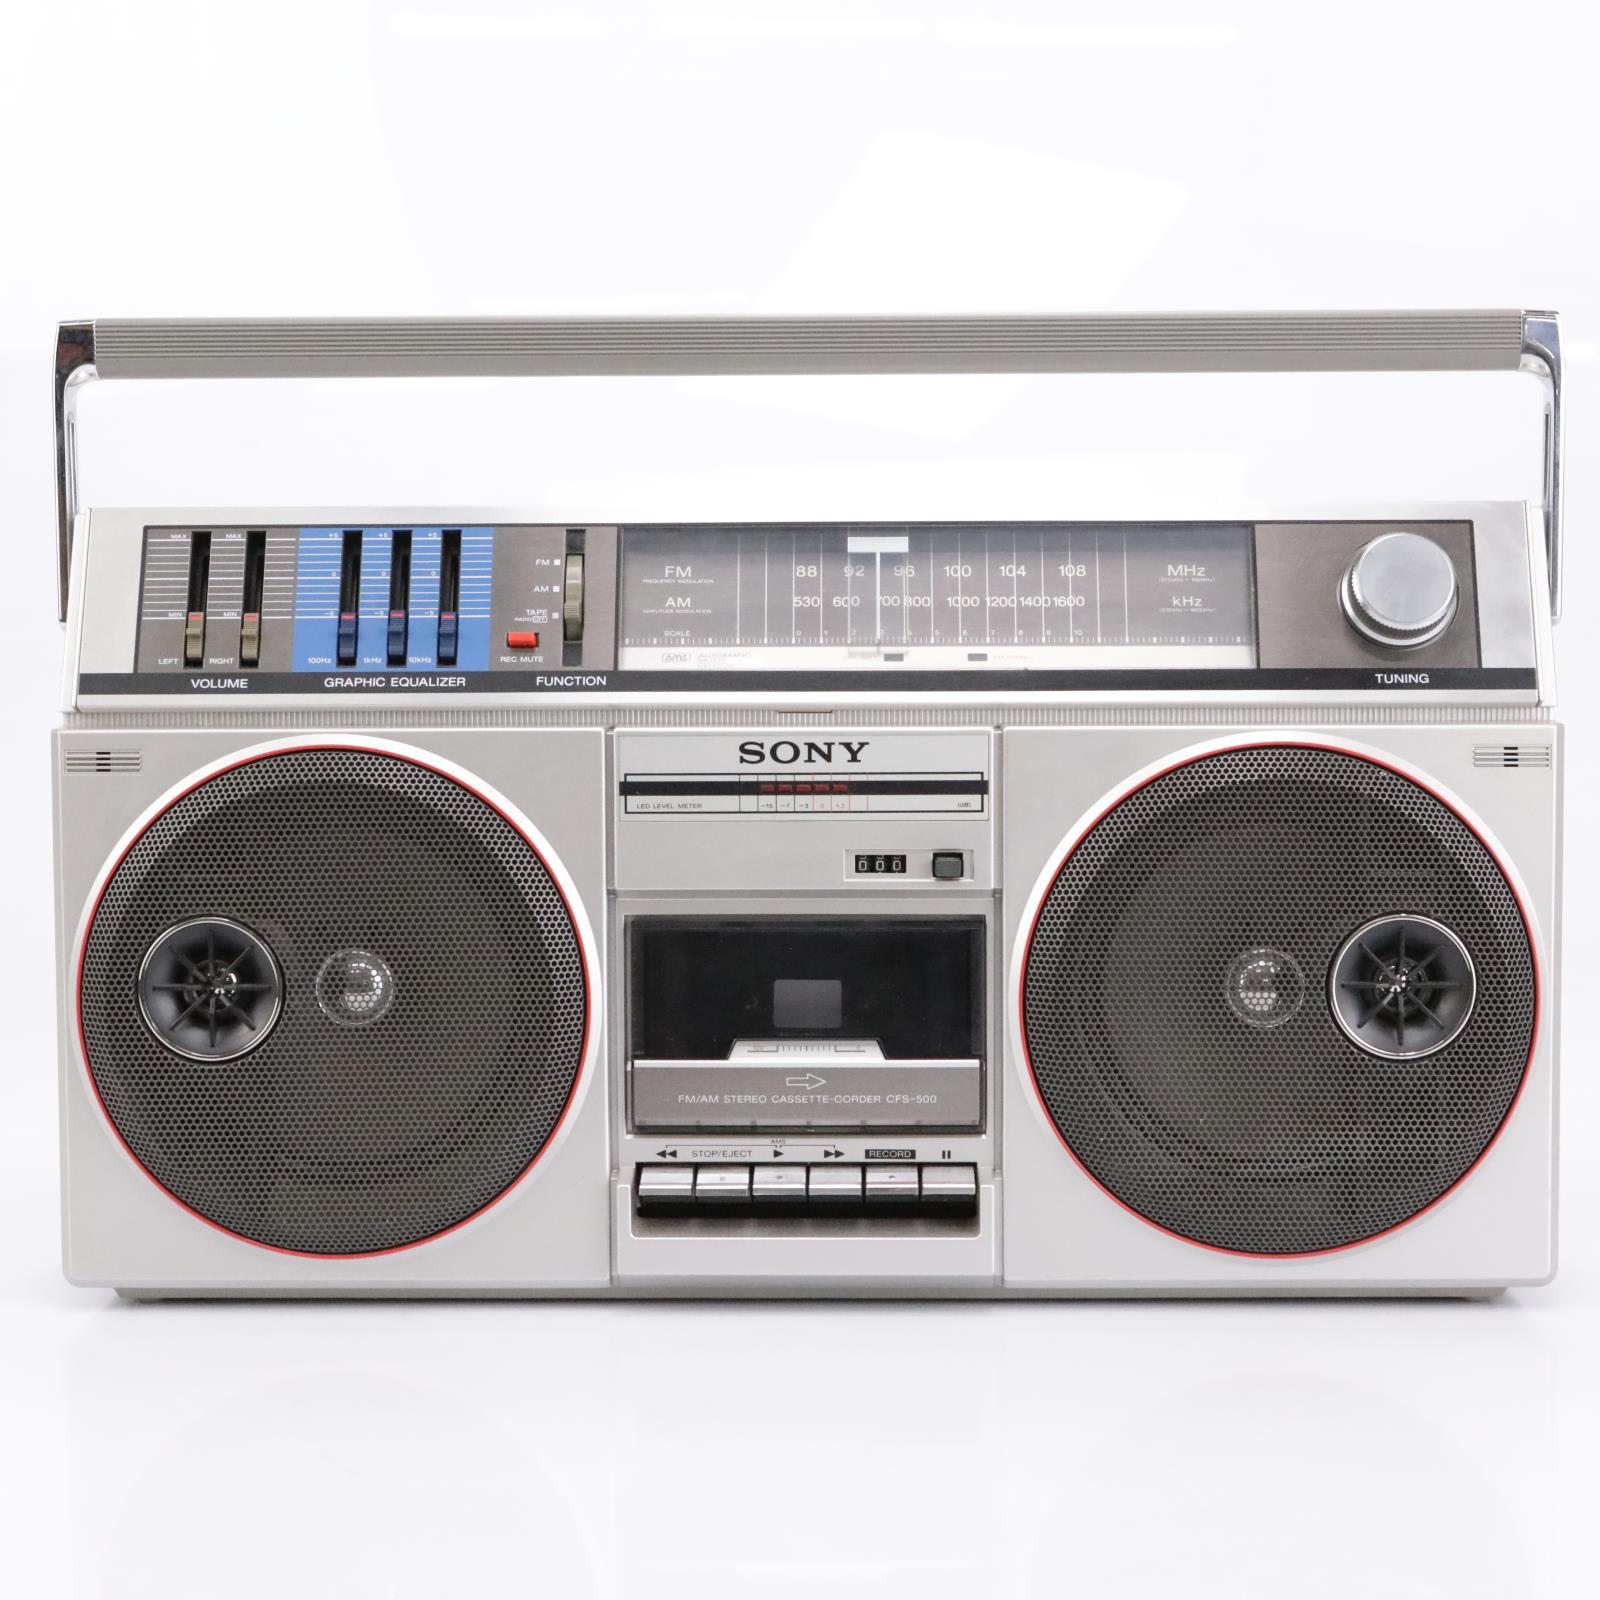 Sony CFS-500 Boom Box AM/FM Radio / Stereo Cassette Player w/ Graphic EQ #43193